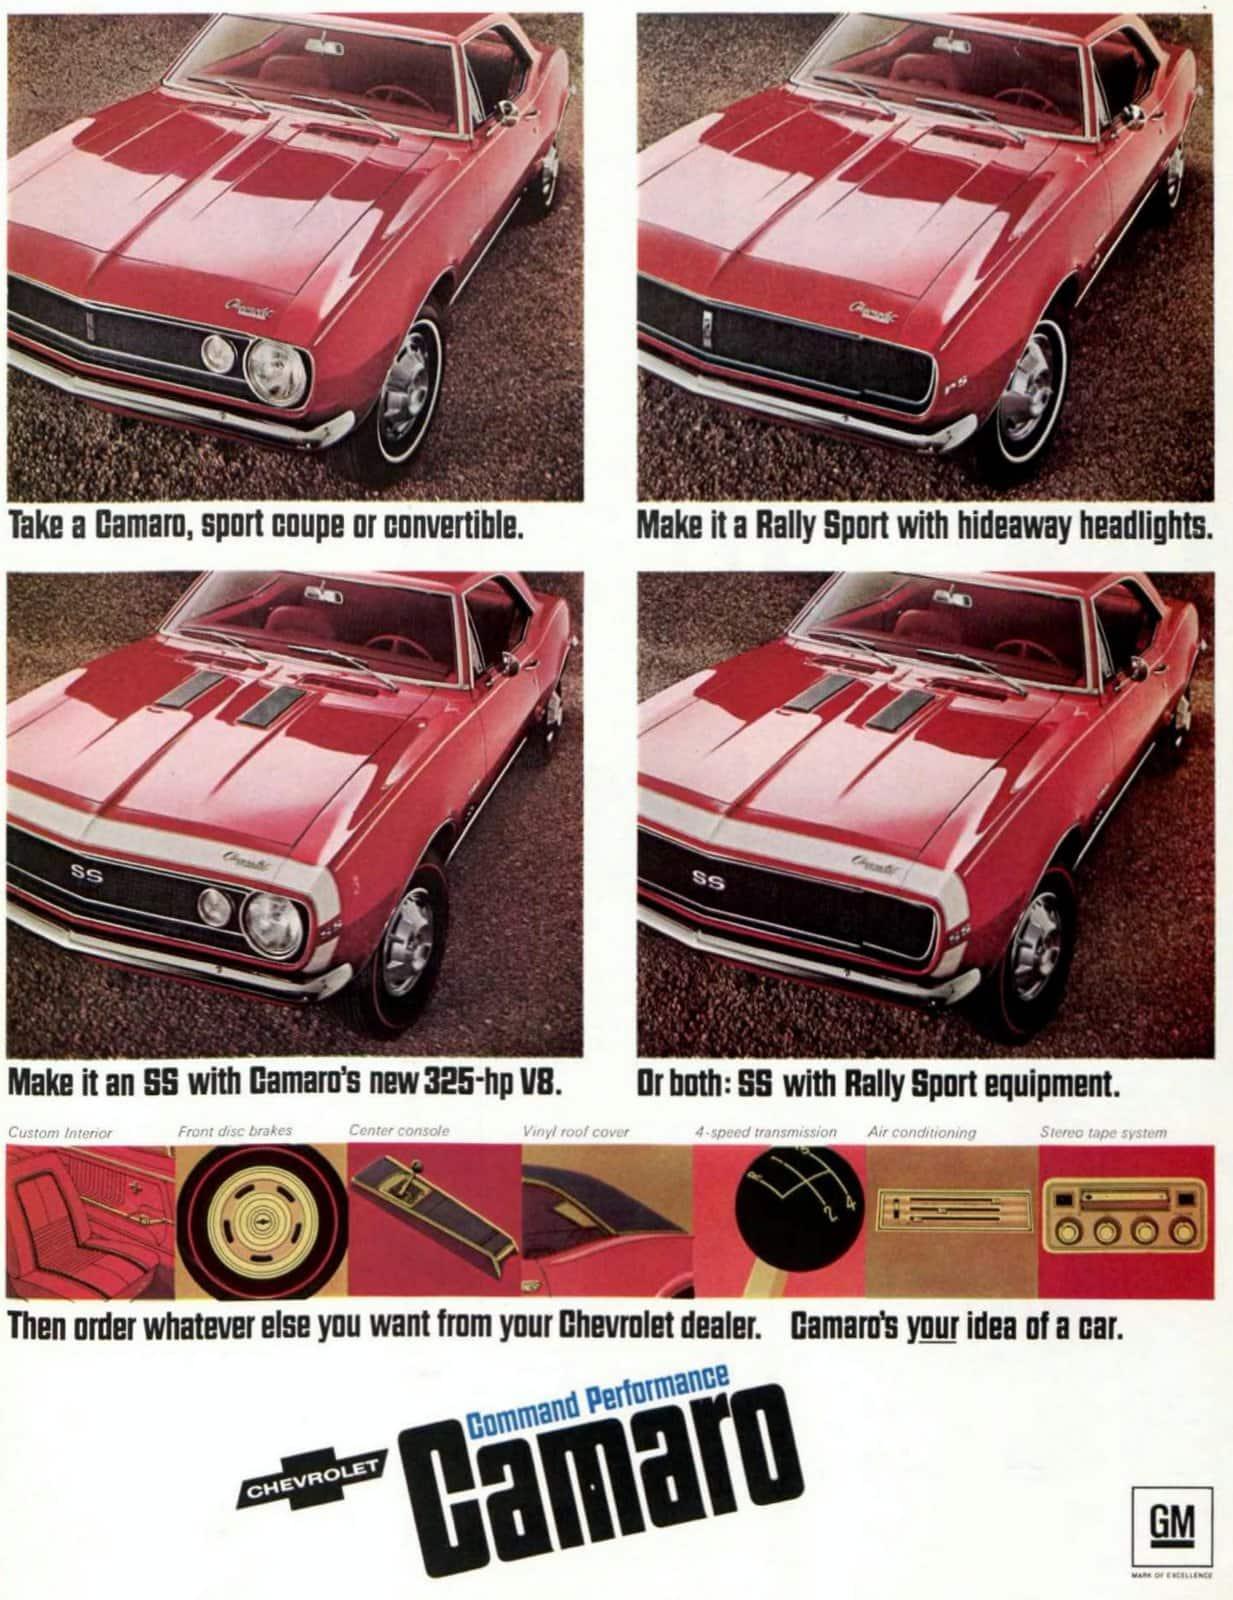 Classic 67 Camaro cars - Choices